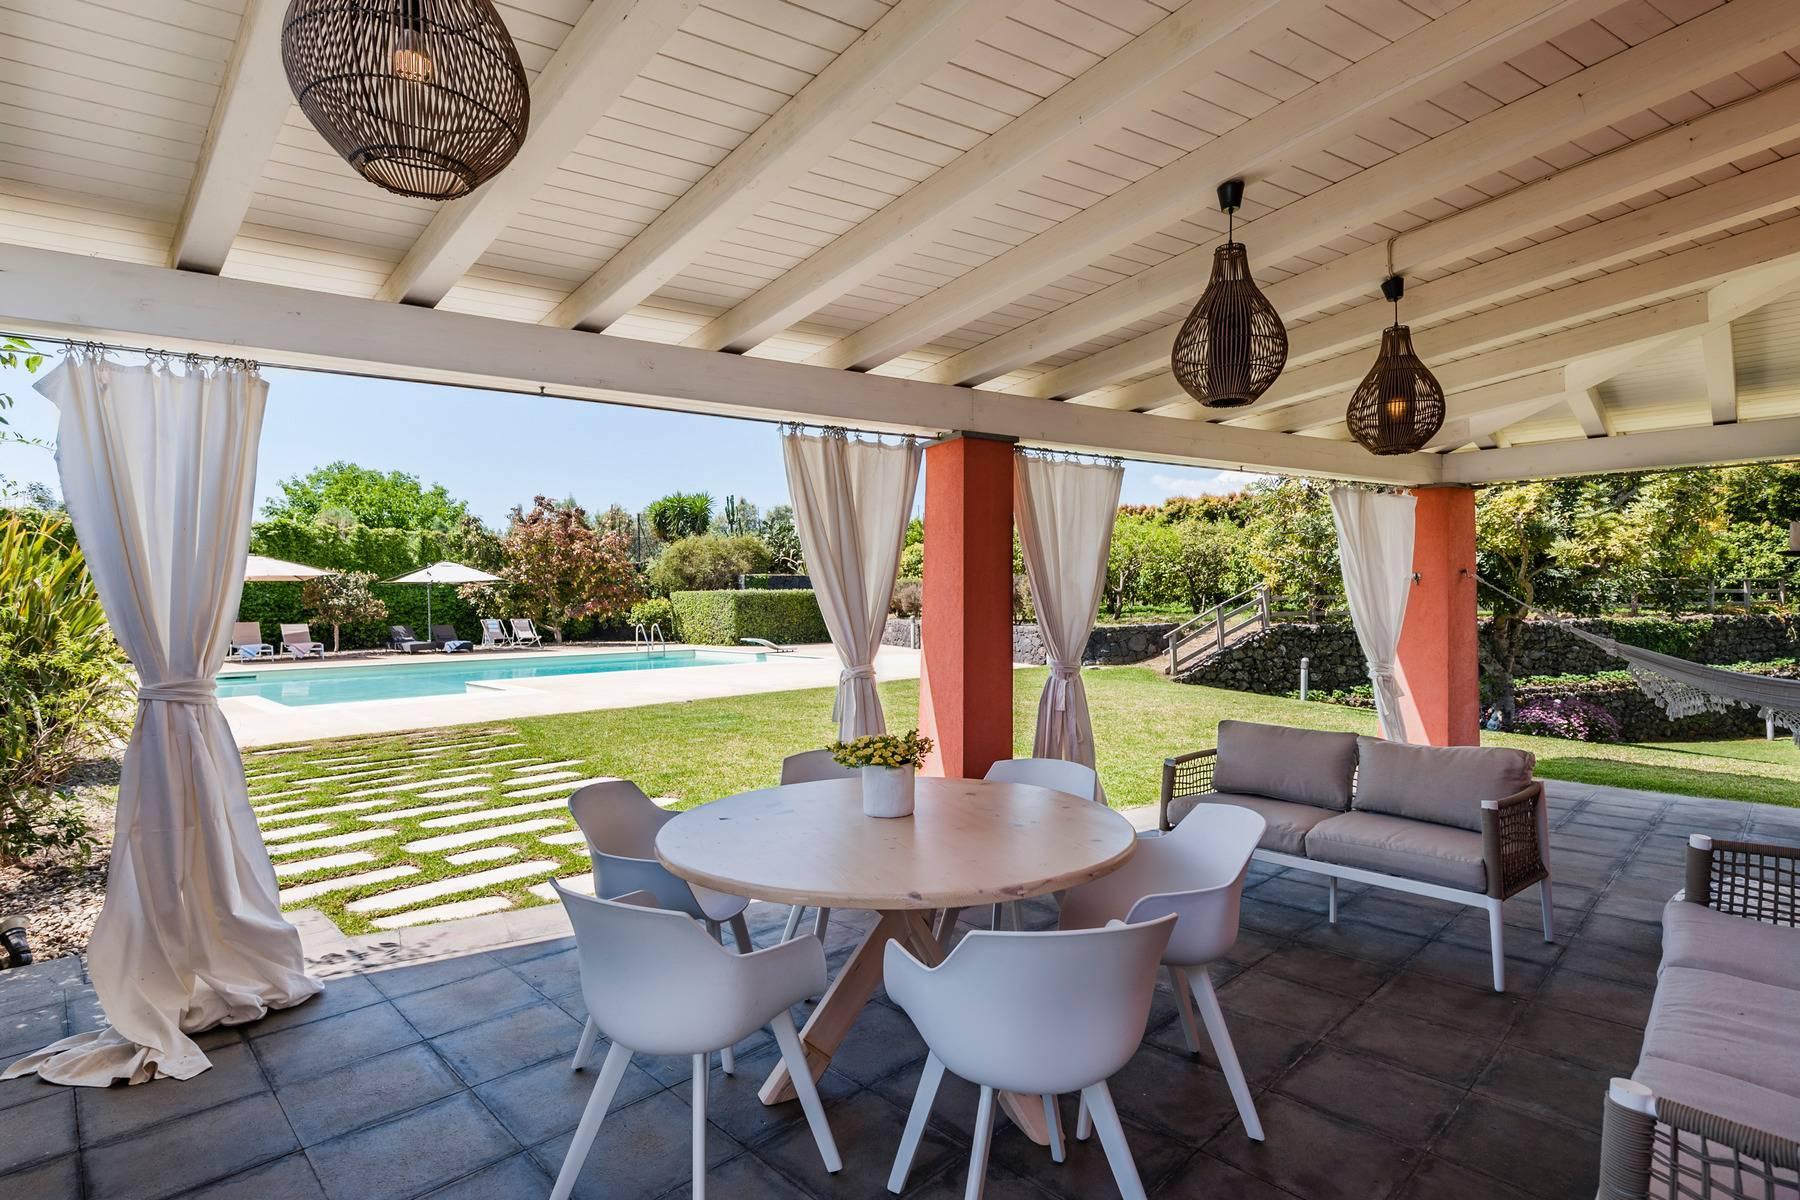 Villa esclusiva con piscina con vista ad Acireale - 3